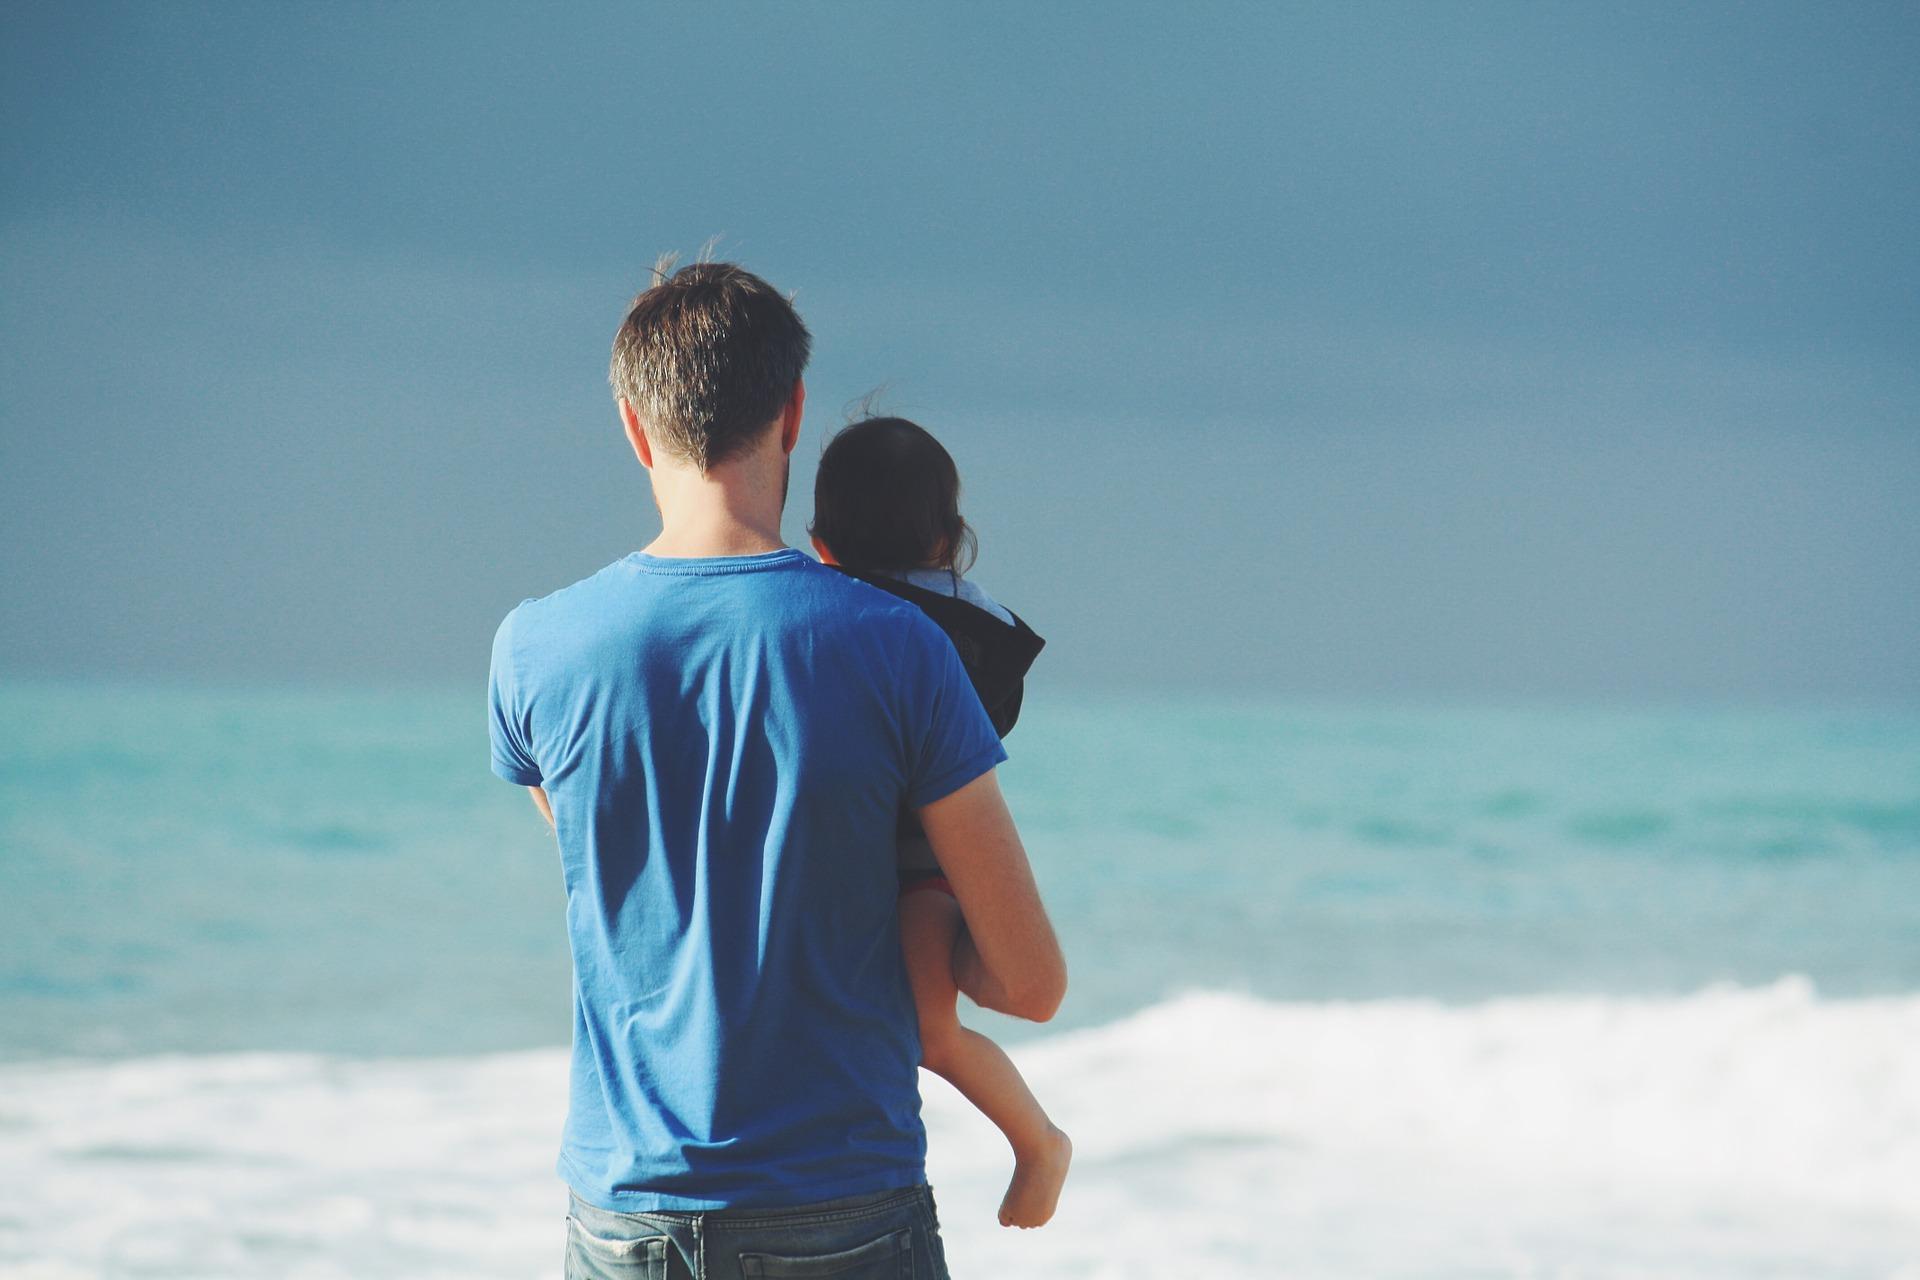 Оспаривание отцовства: судебная практика